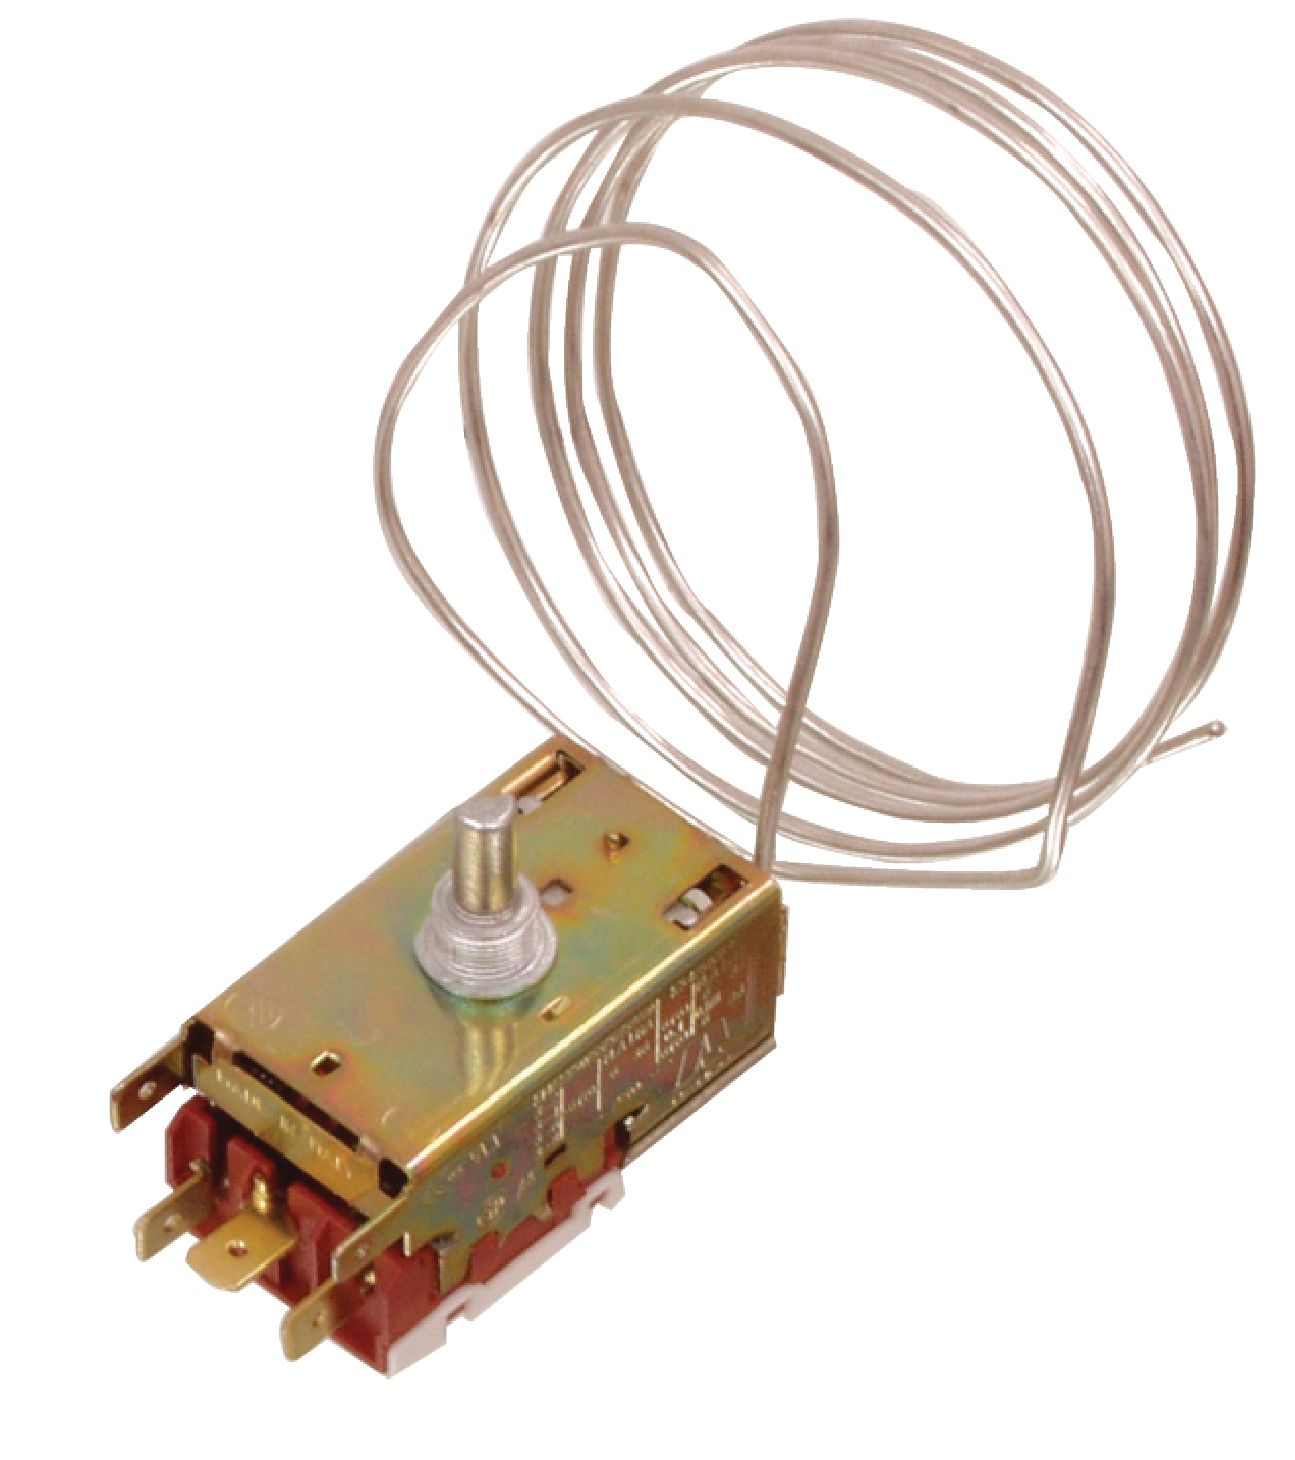 Termostat pro lednice, Ranco VL9, VT9